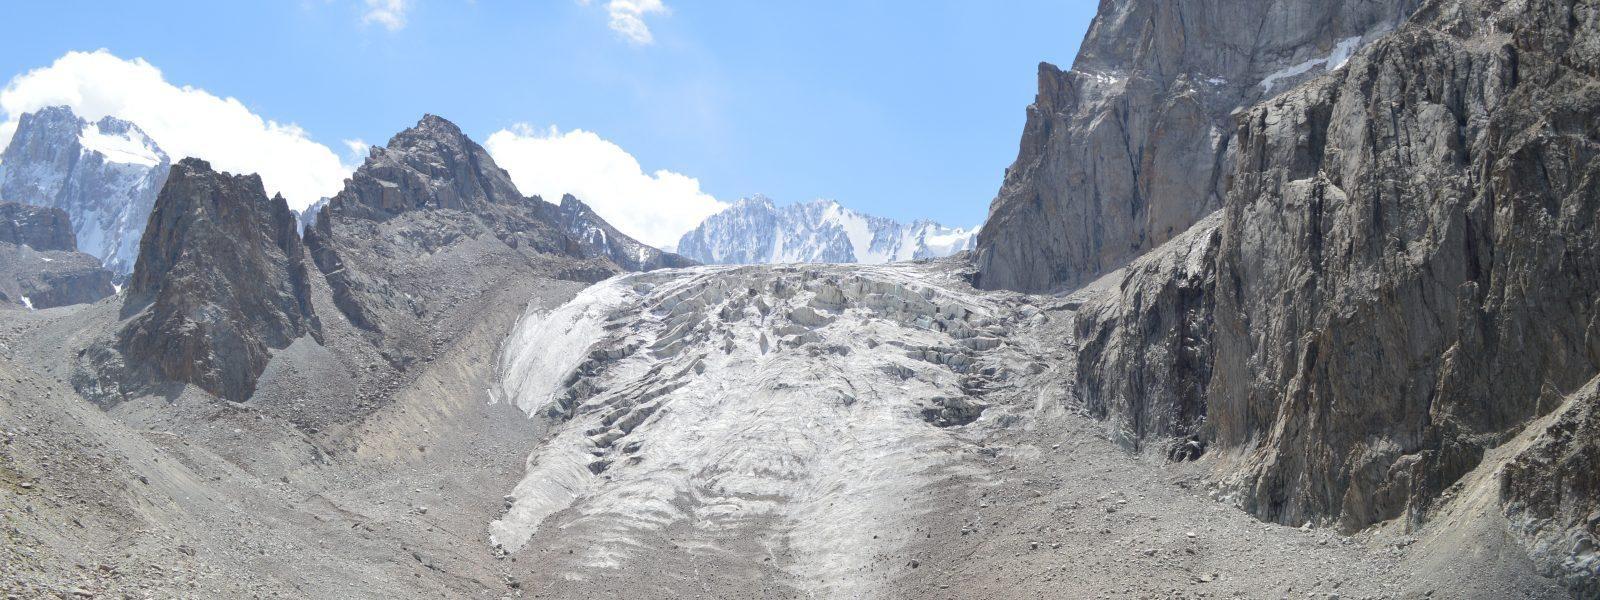 Ak Sai Glacier Basin Ala Archa National Park Kyrgyzstan